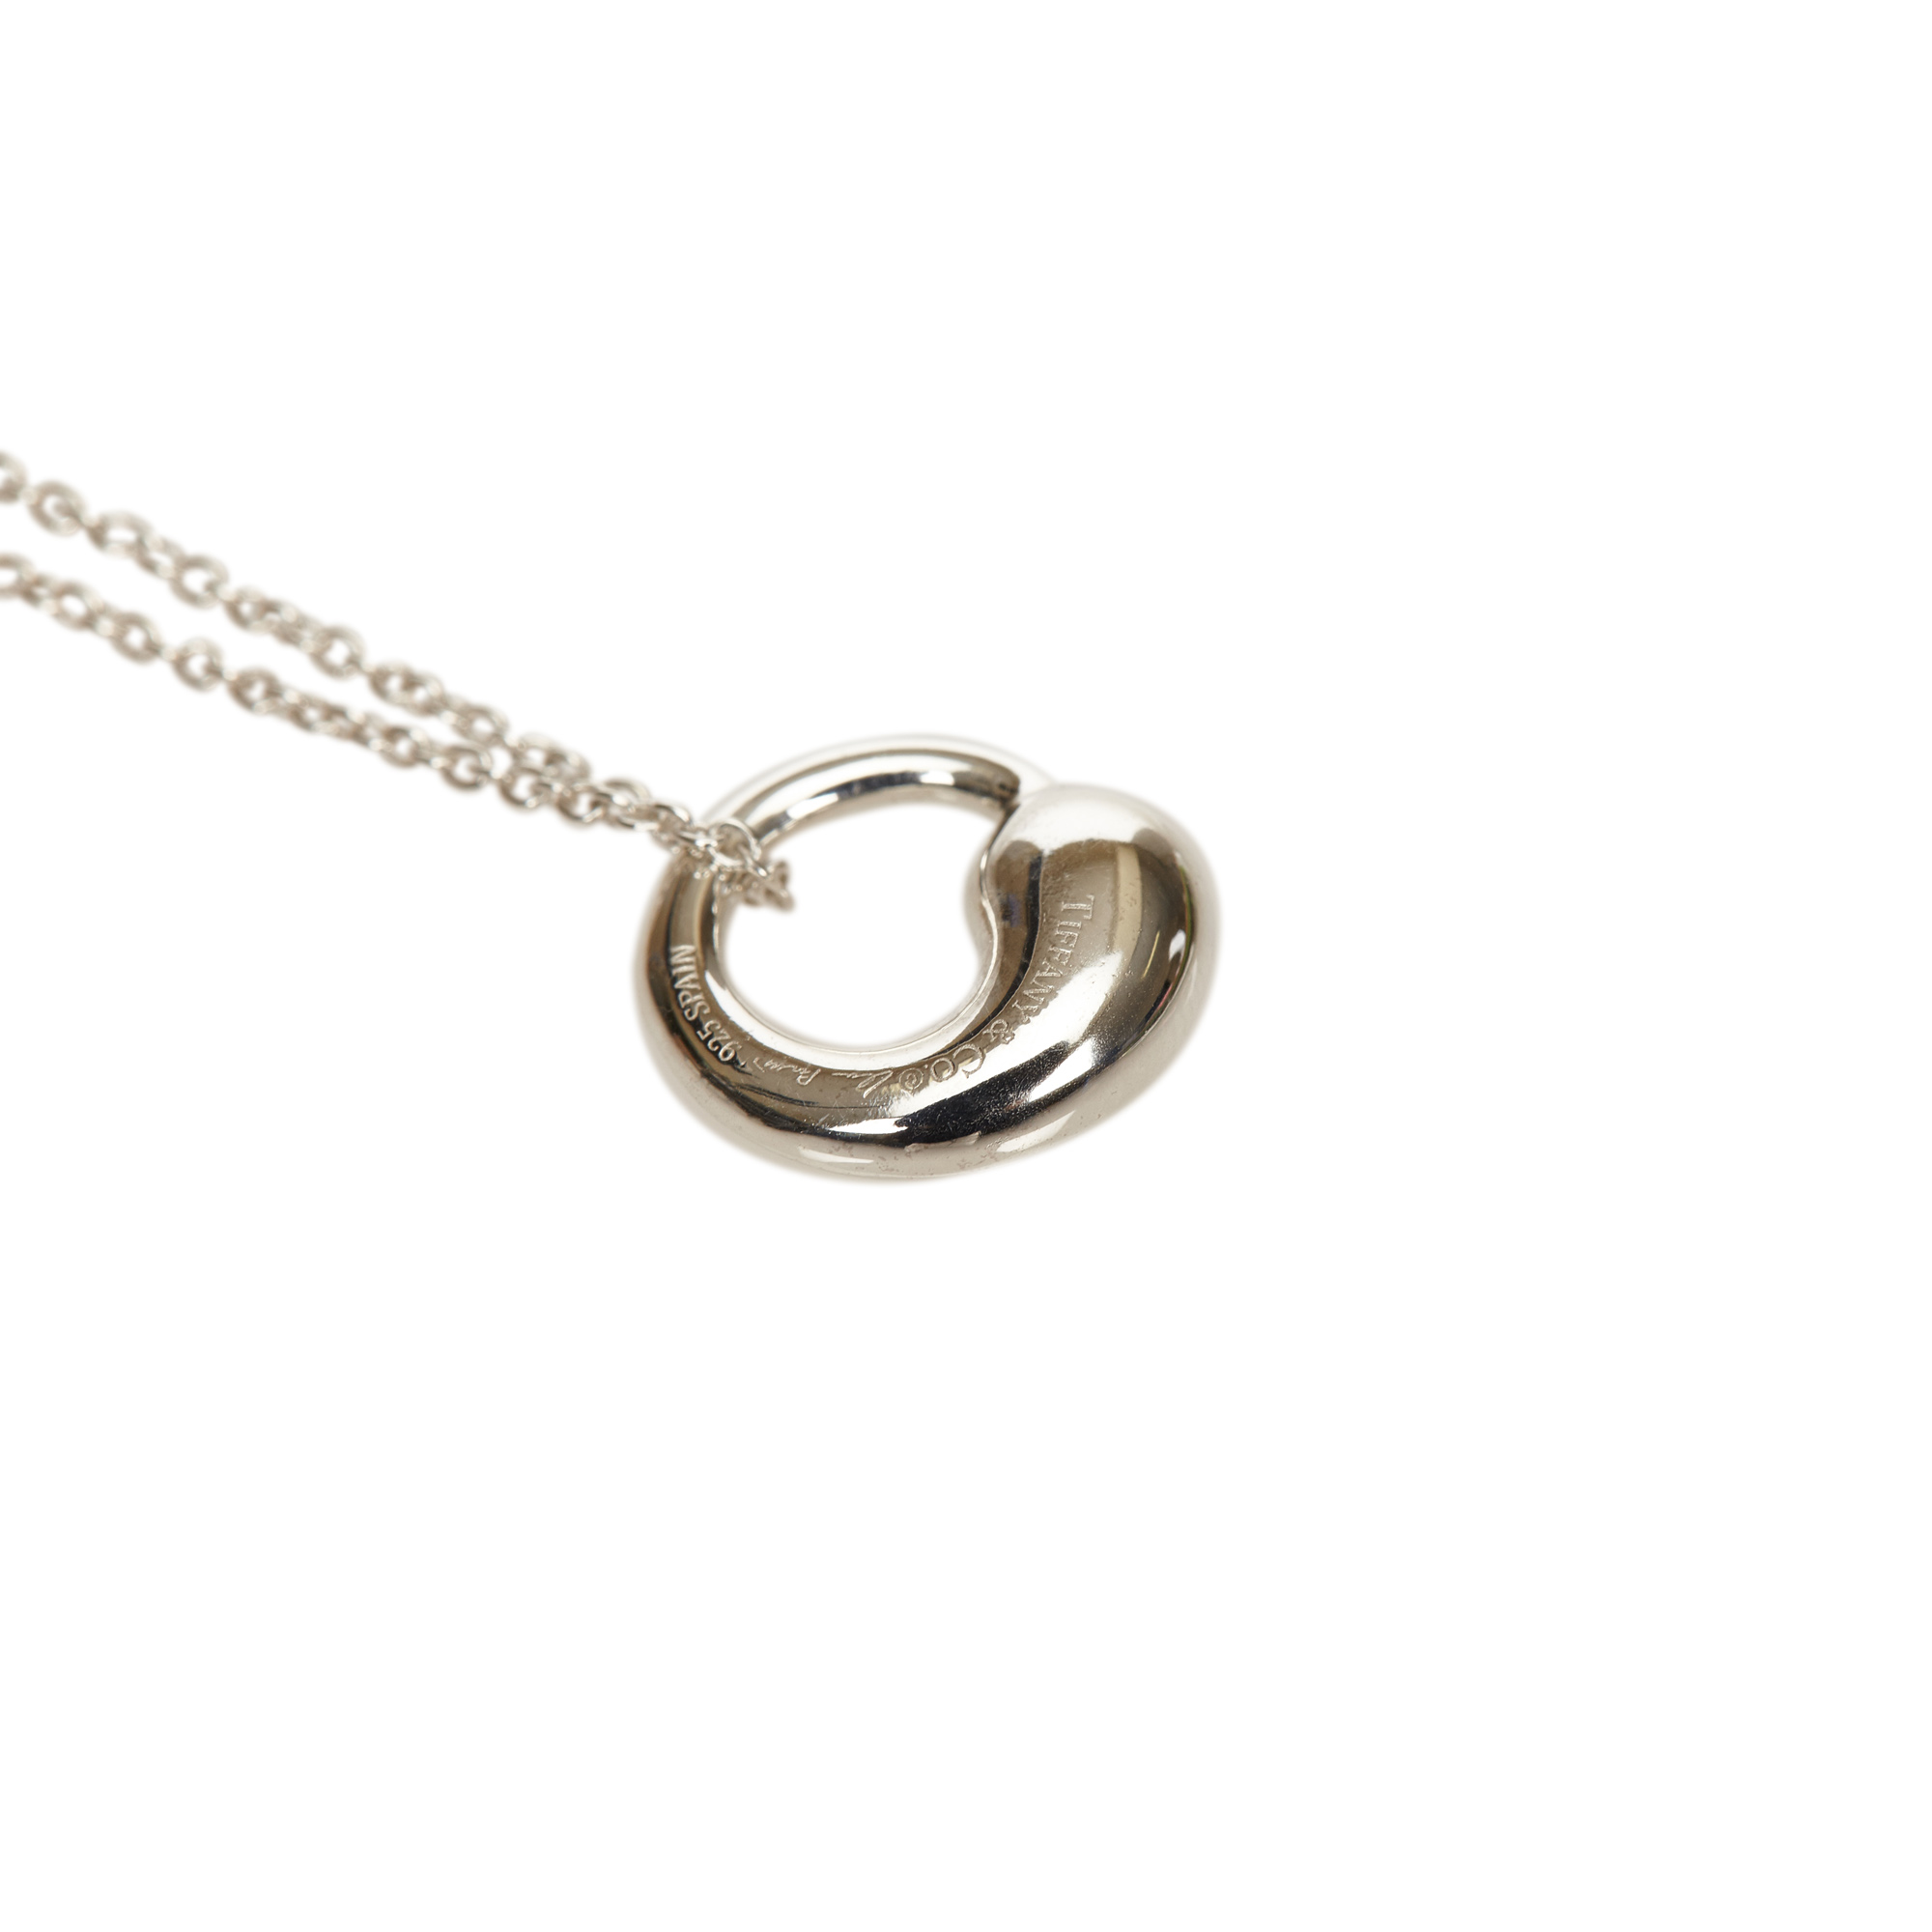 Tiffany & Co. Elsa Peretti Eternal Circle Silver Pendant Necklace